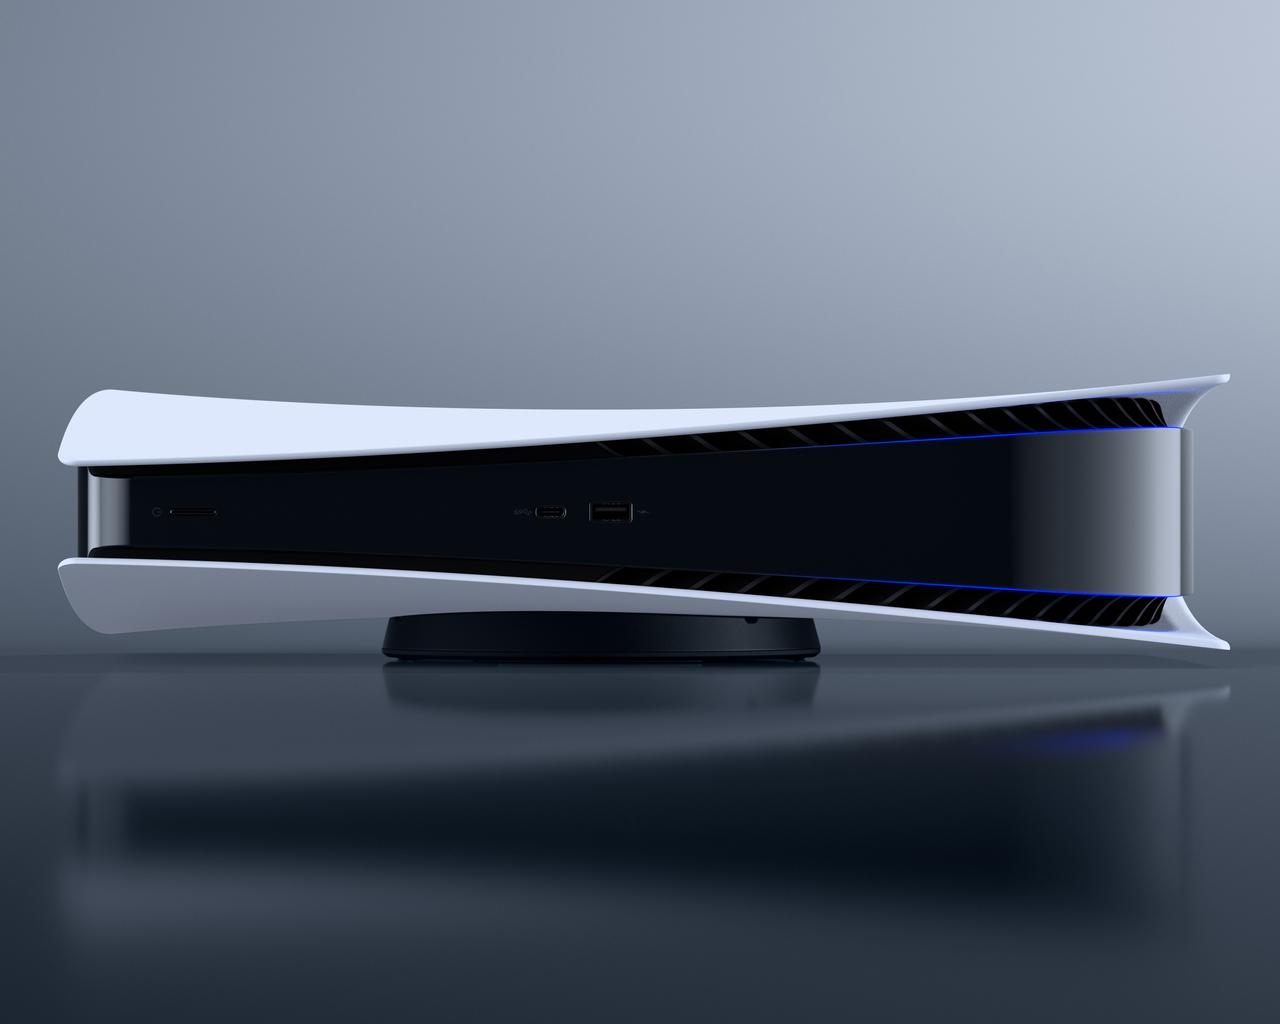 playstation-5-digital-edition-5k-km.jpg